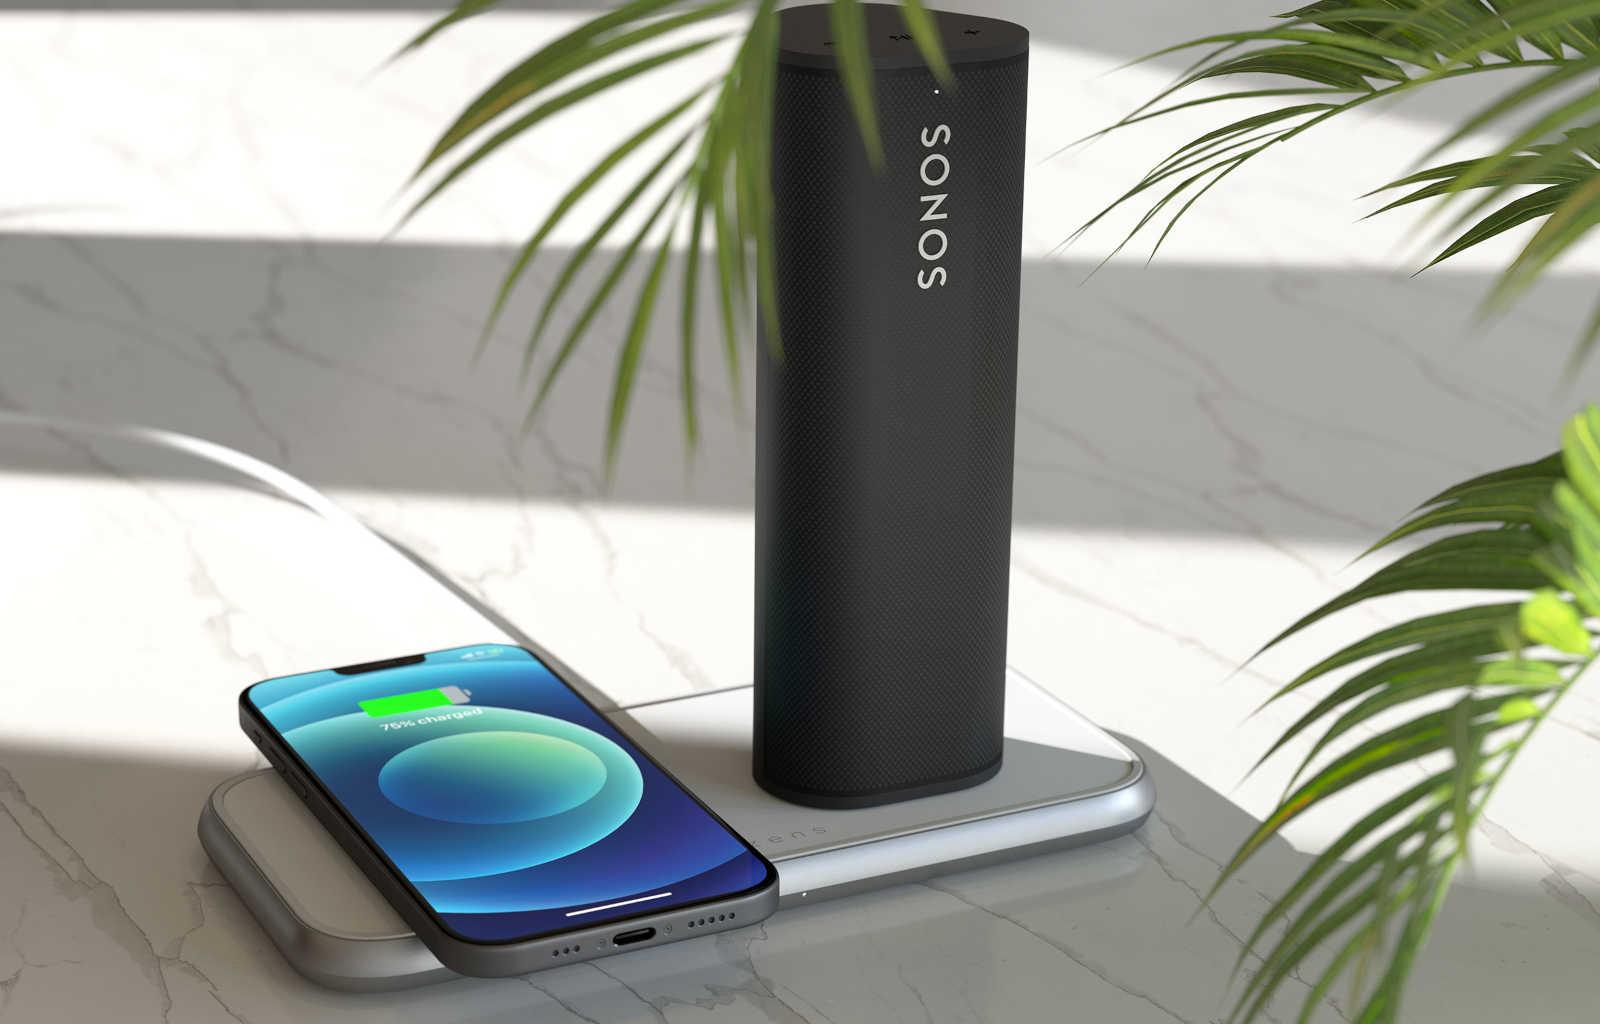 Aluminium dual charger charging iPhone 12 and Sonos Roam